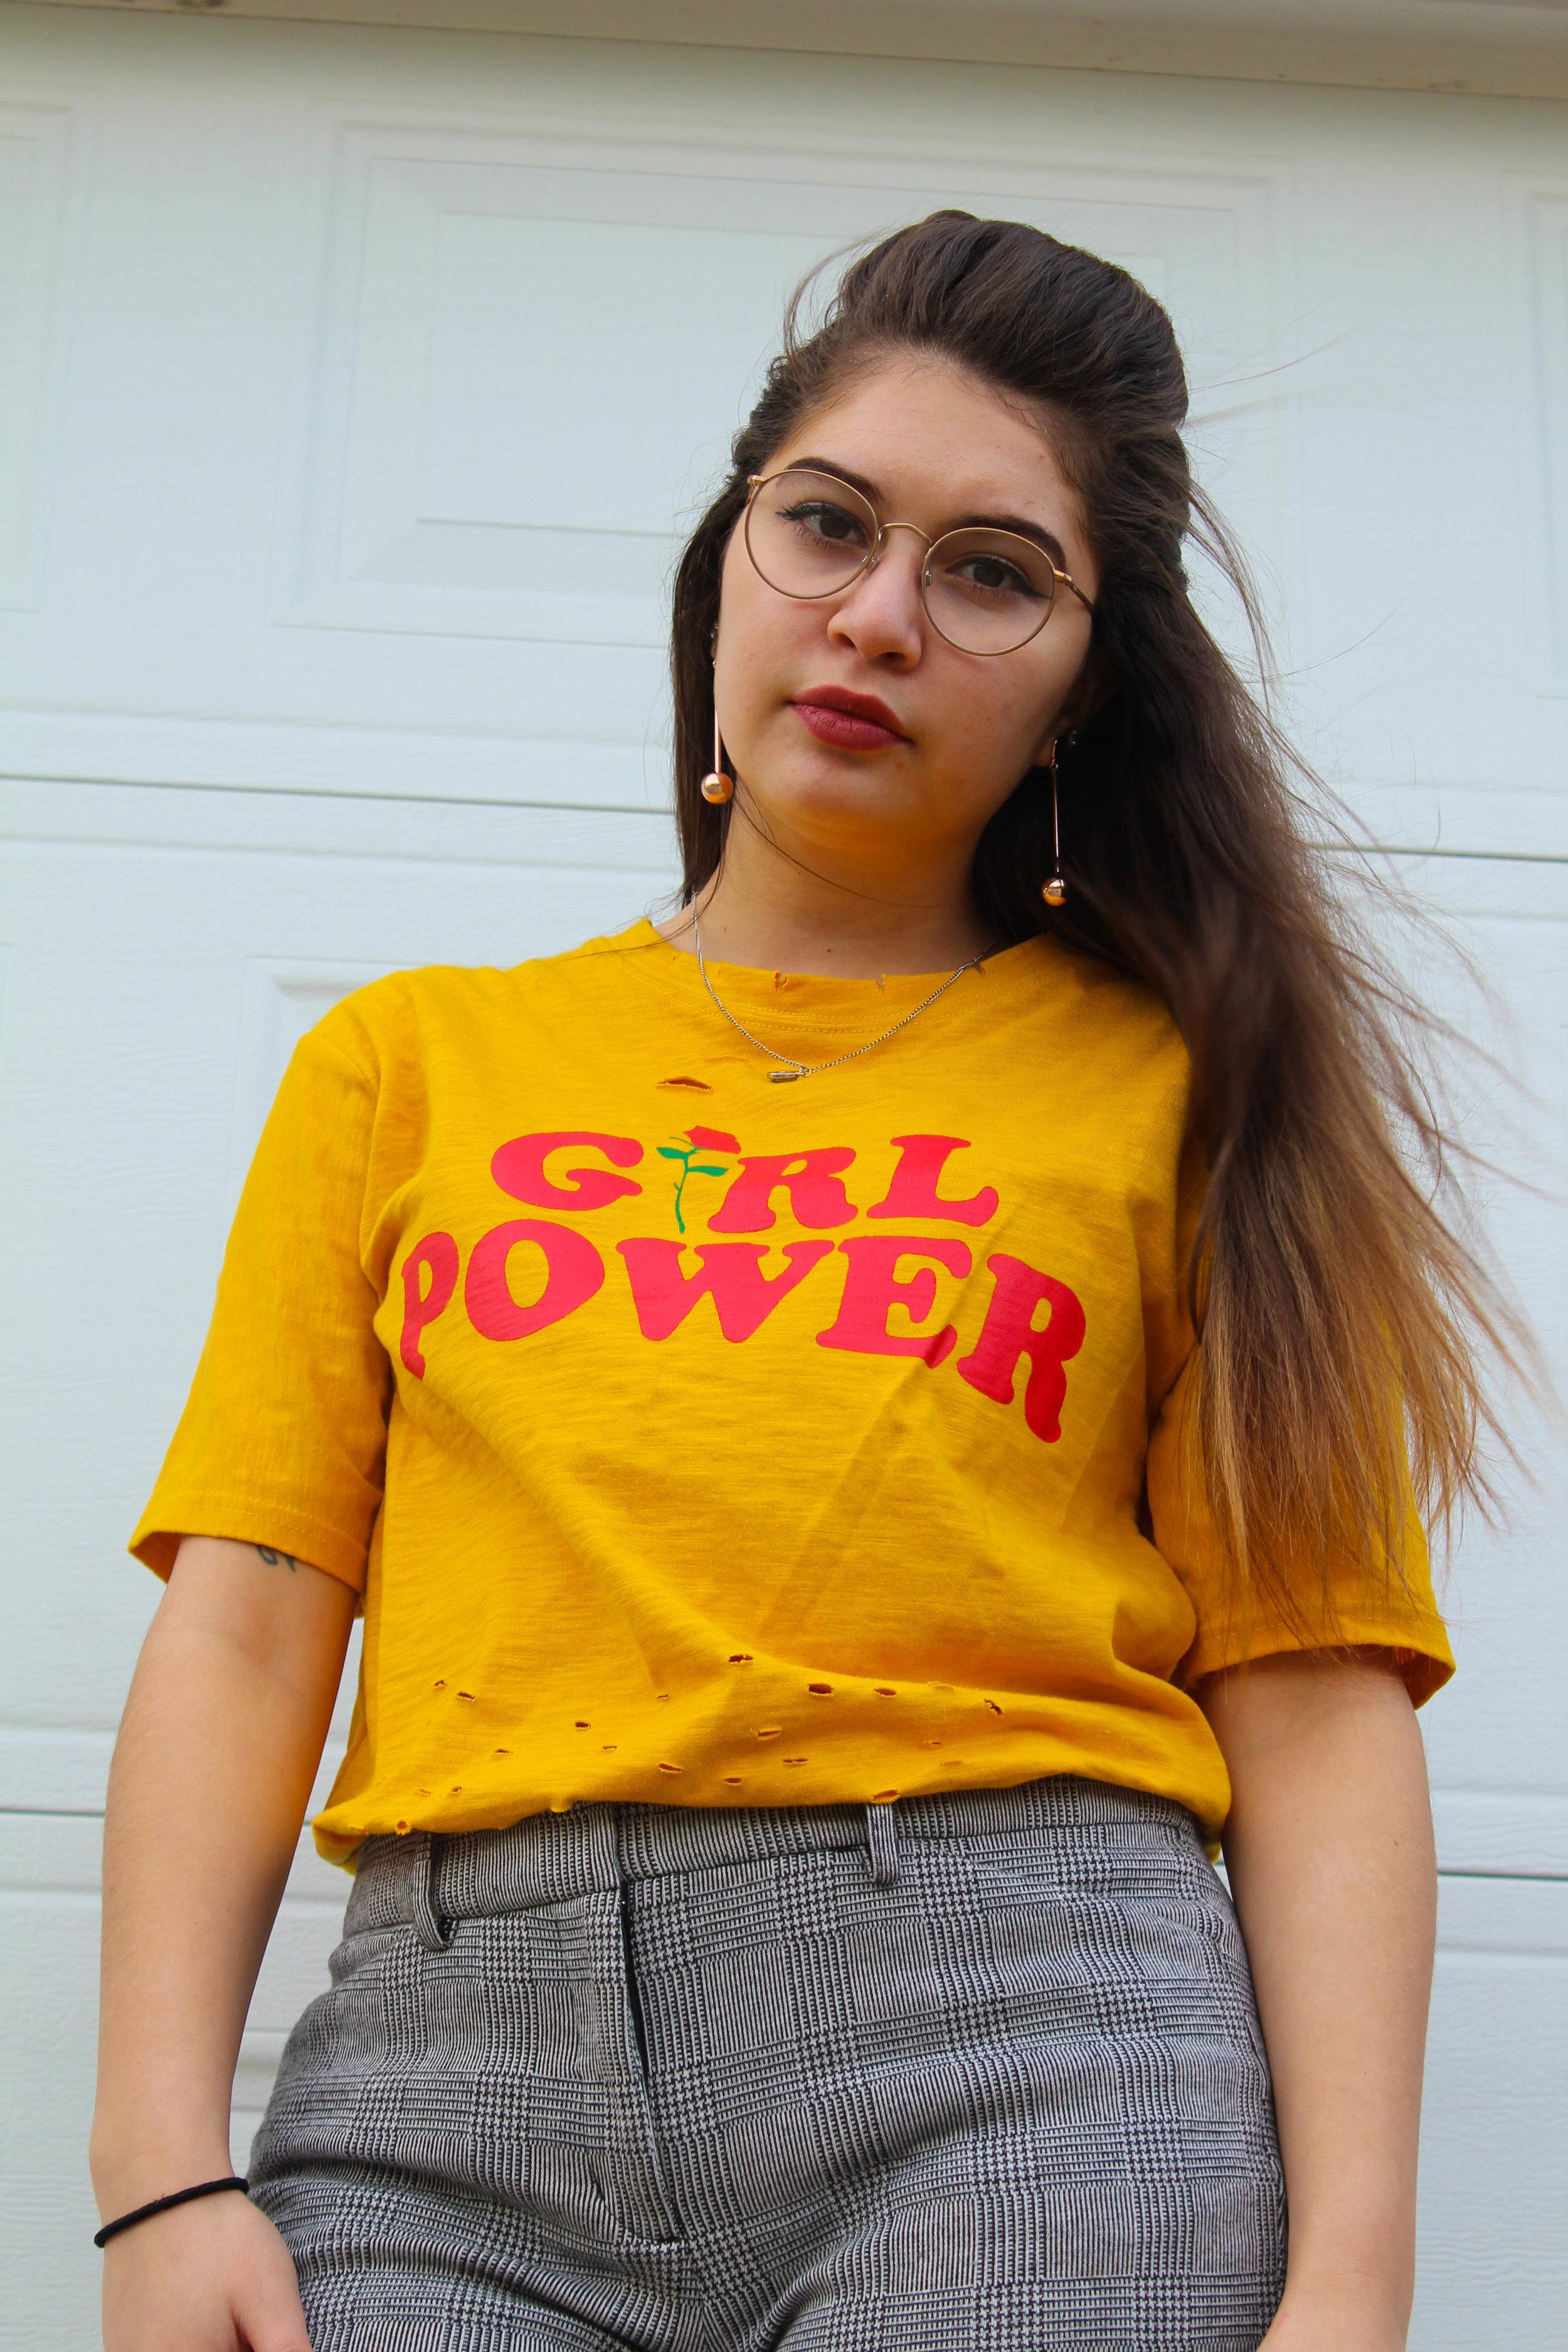 Work-Girl Power outfit-3-2978.jpg